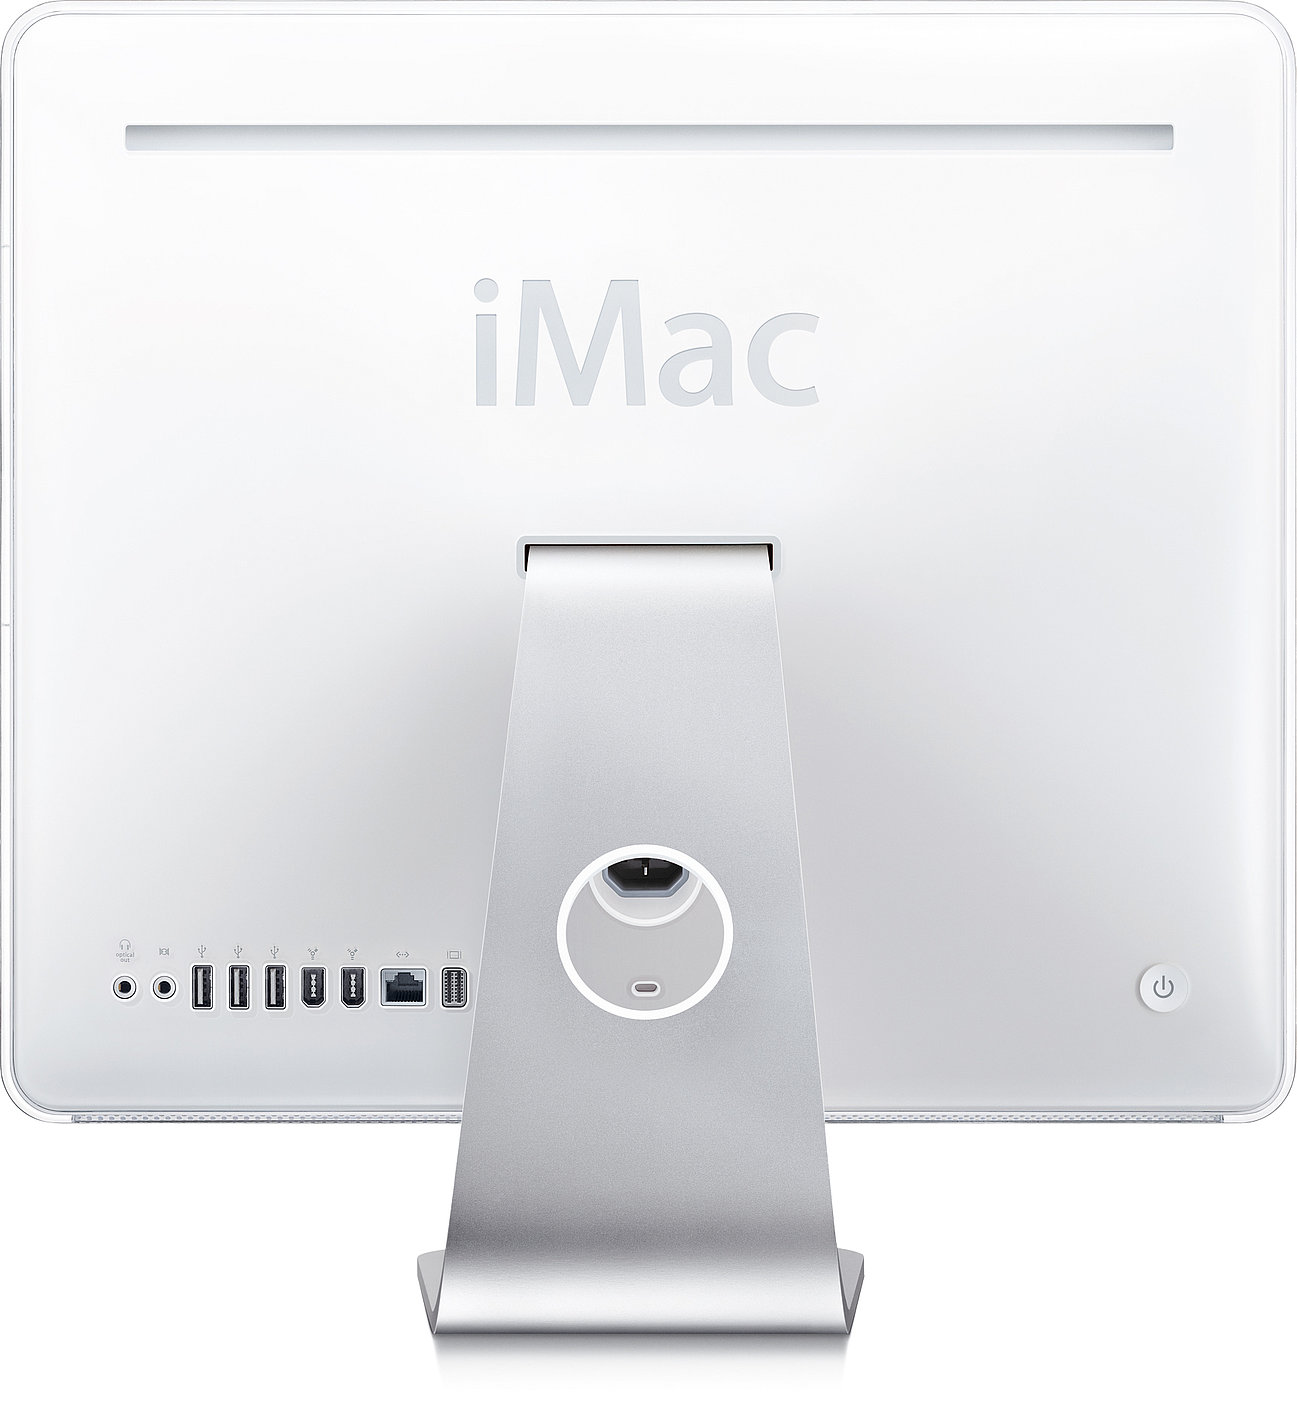 iMac G5 Computer | Red Dot Design Award